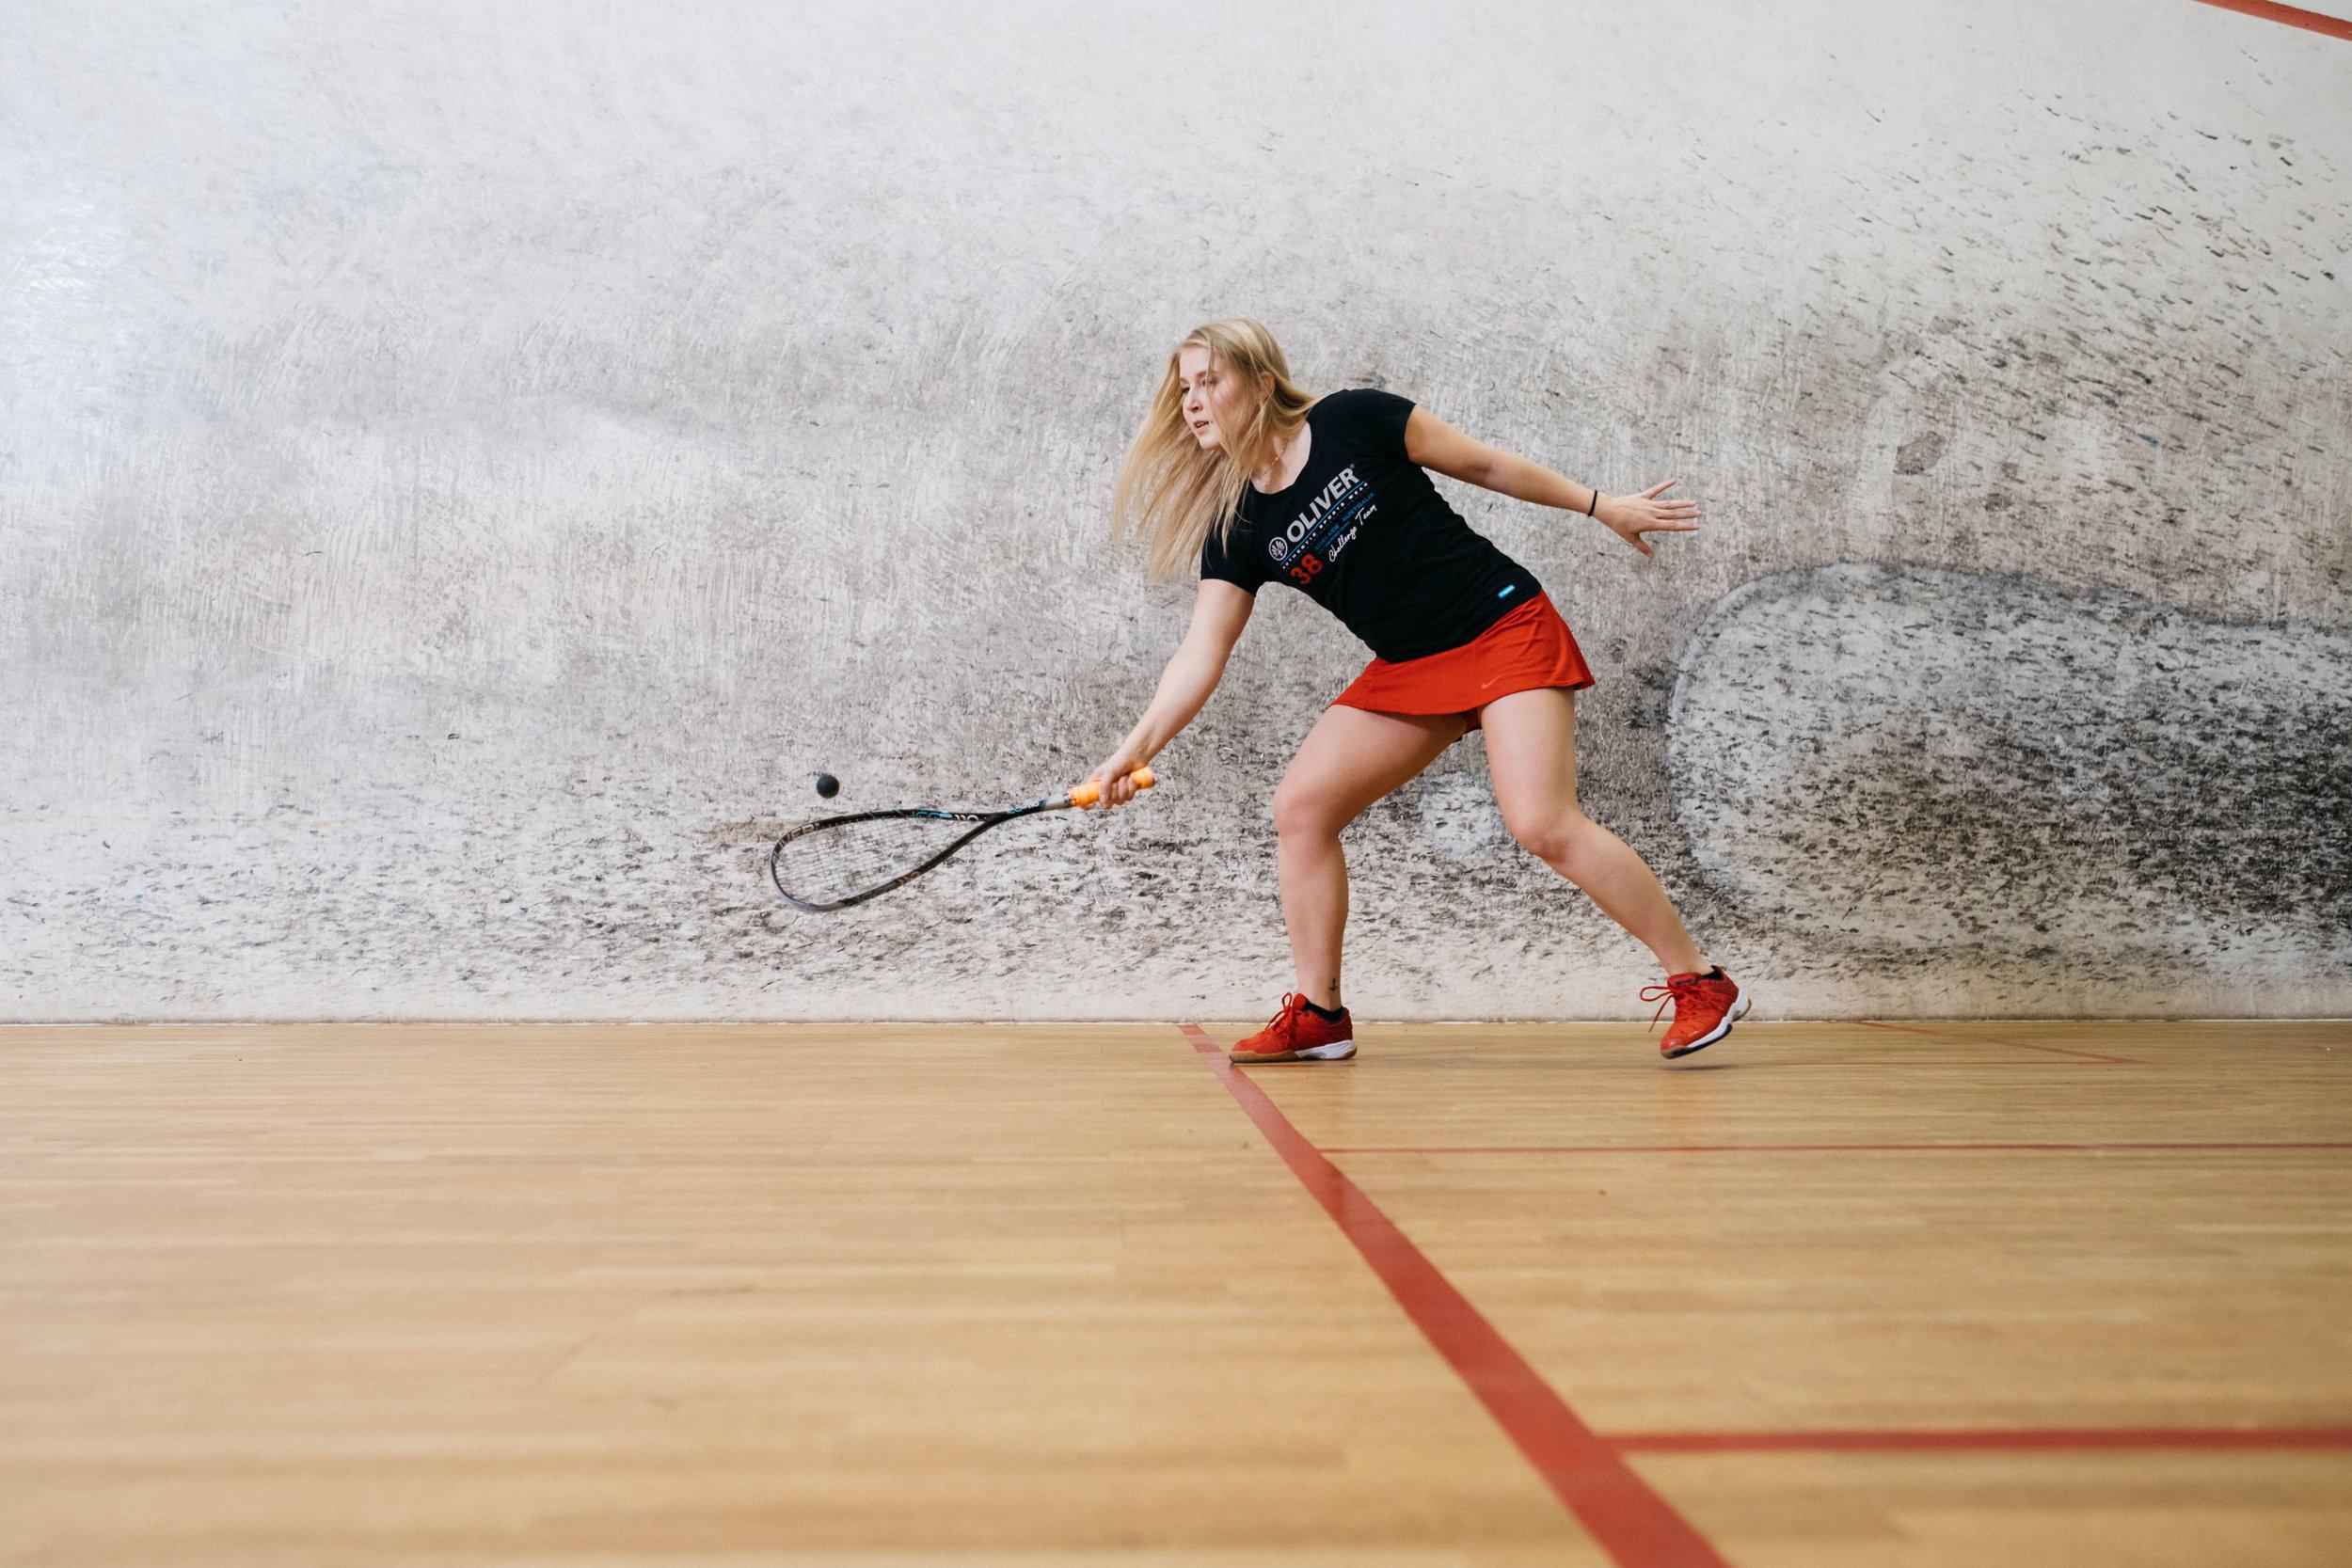 Riina-Koskinen-Squash-Player